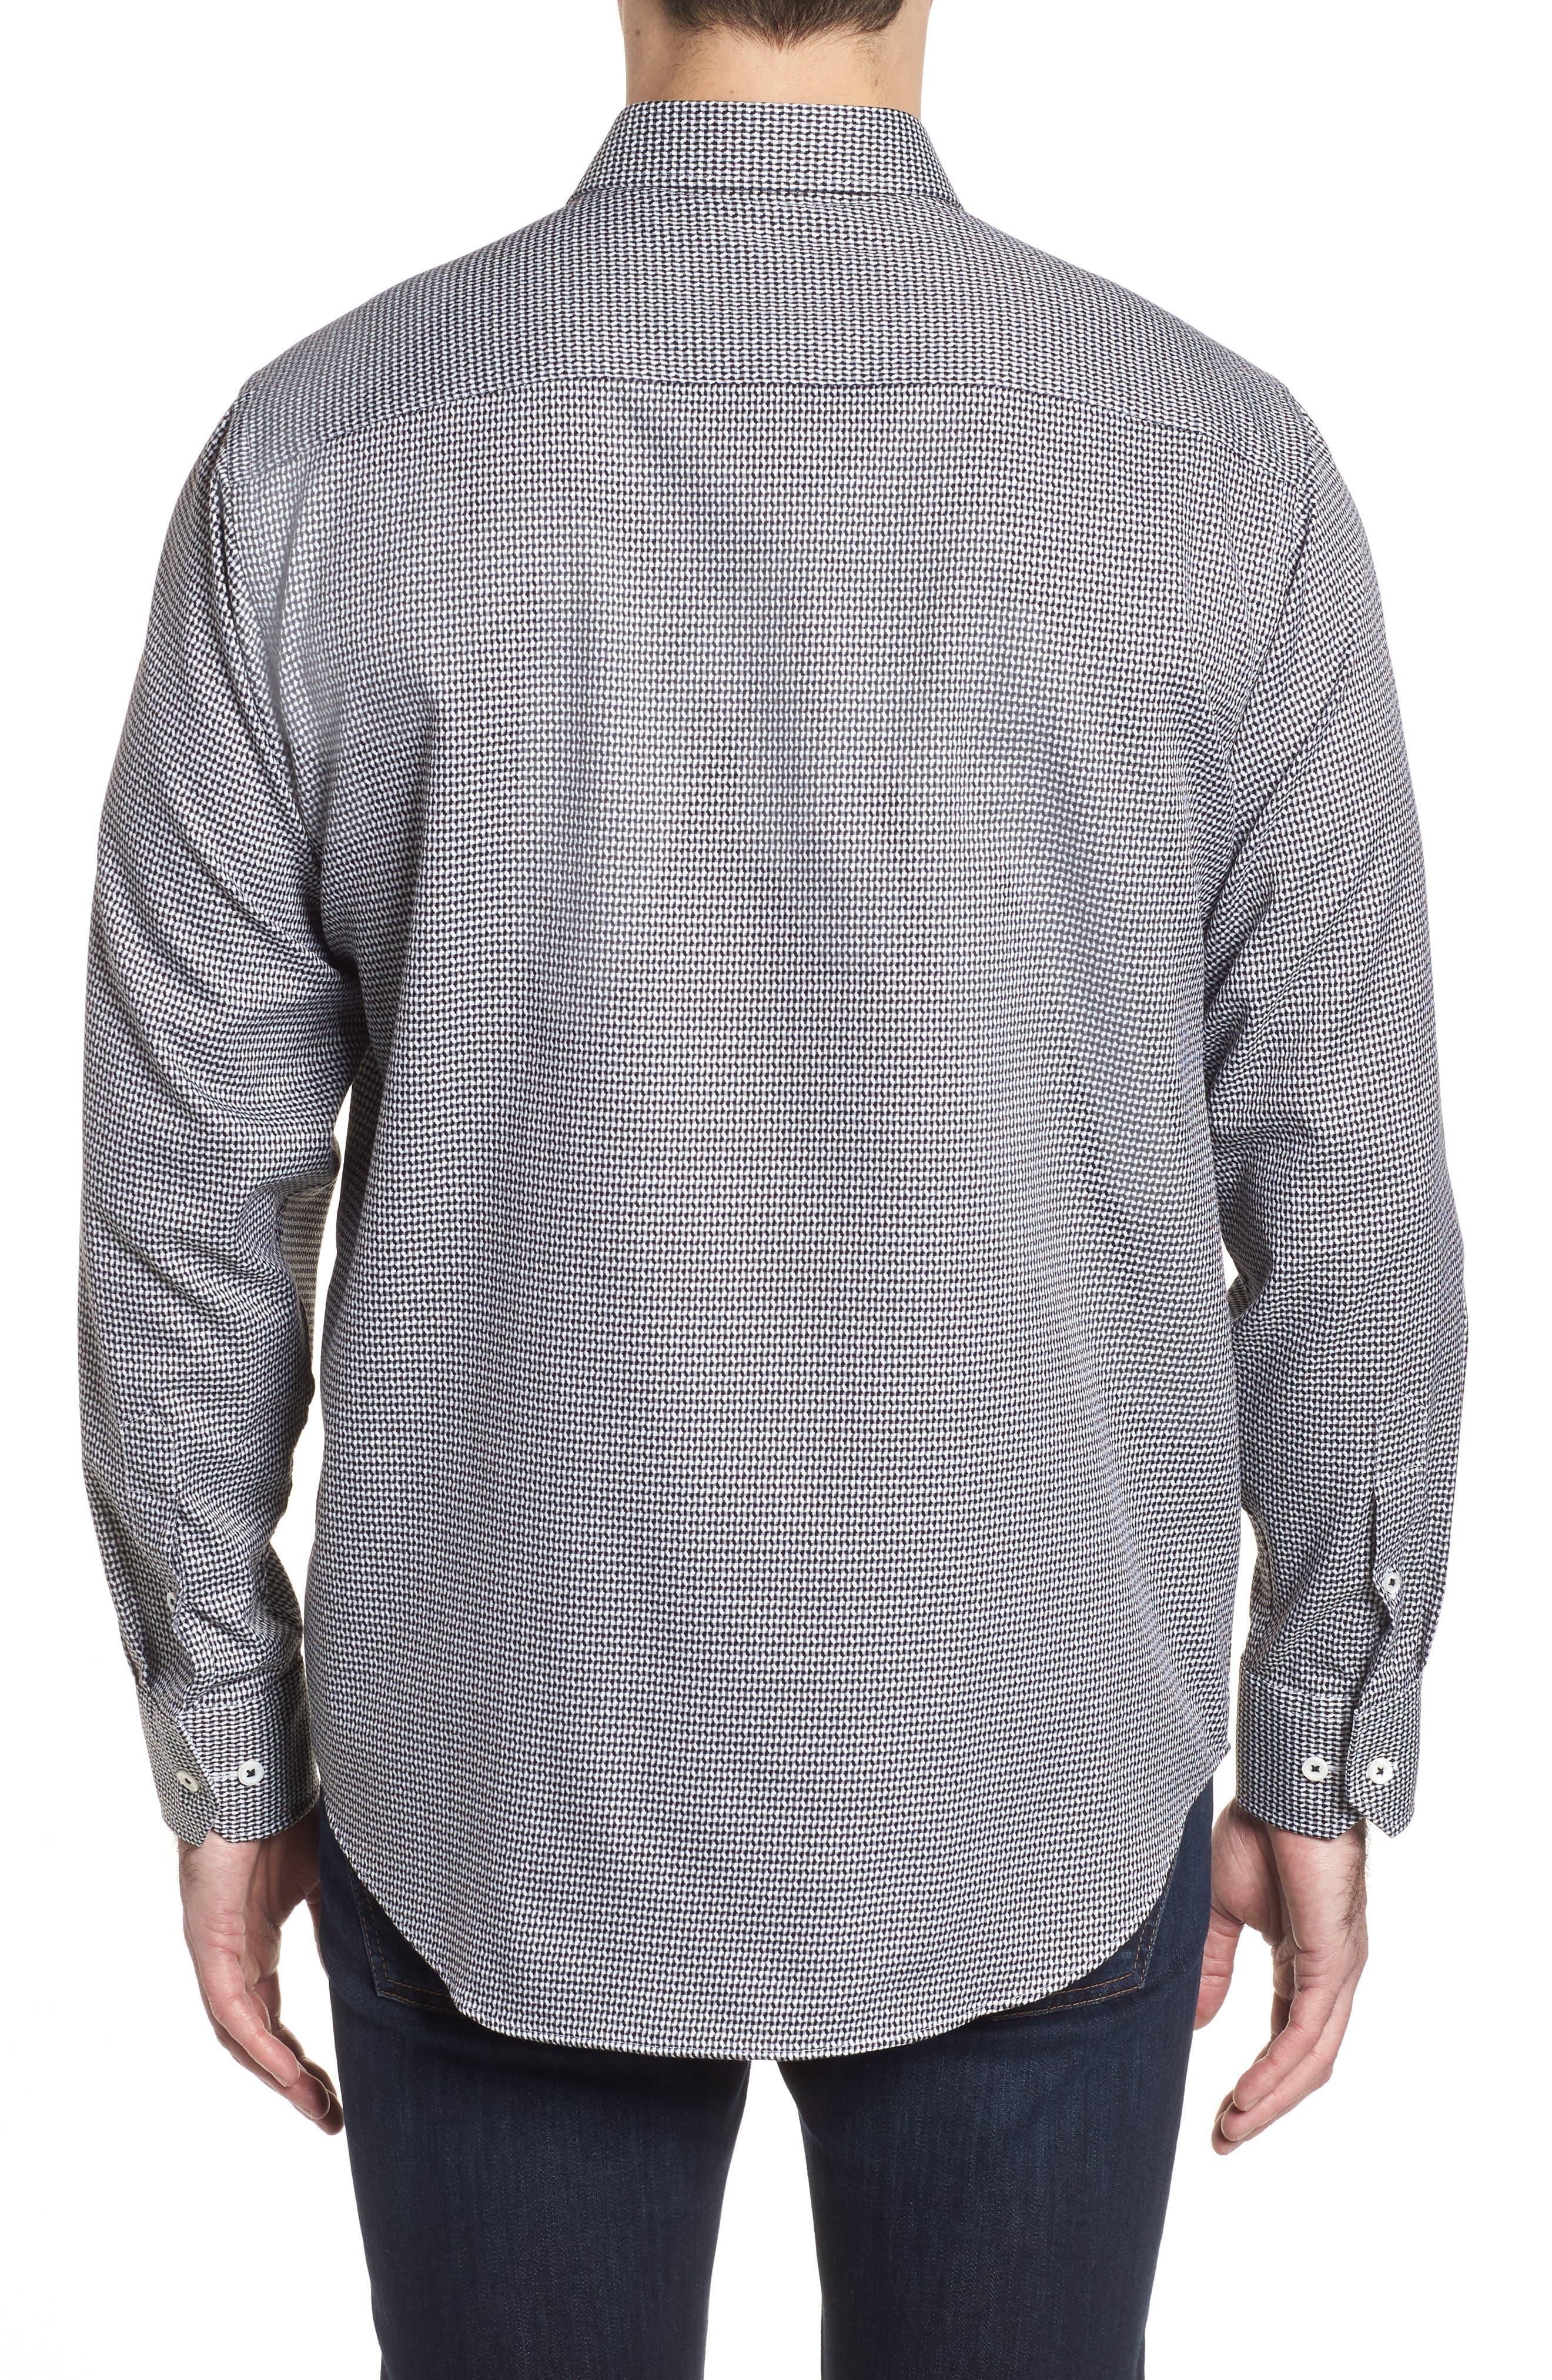 Classic Fit Lines of Distinction Print Sport Shirt,                             Alternate thumbnail 2, color,                             Black